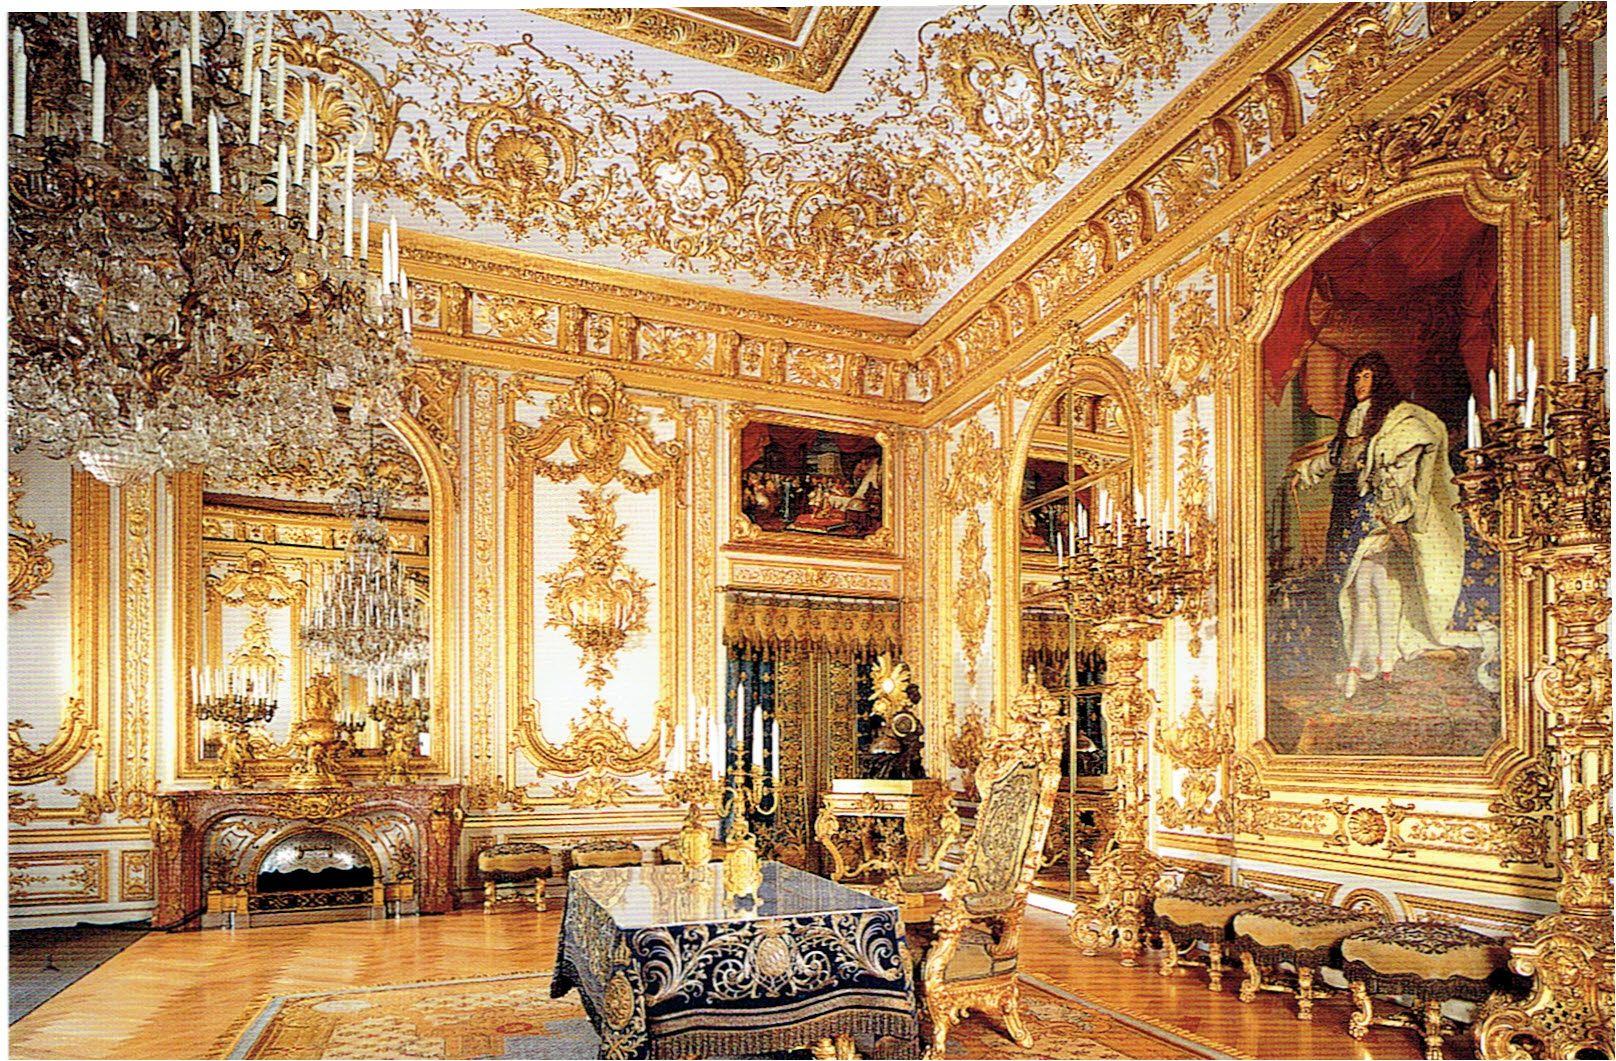 resultado de imagem para herrenchiemsee palace interior